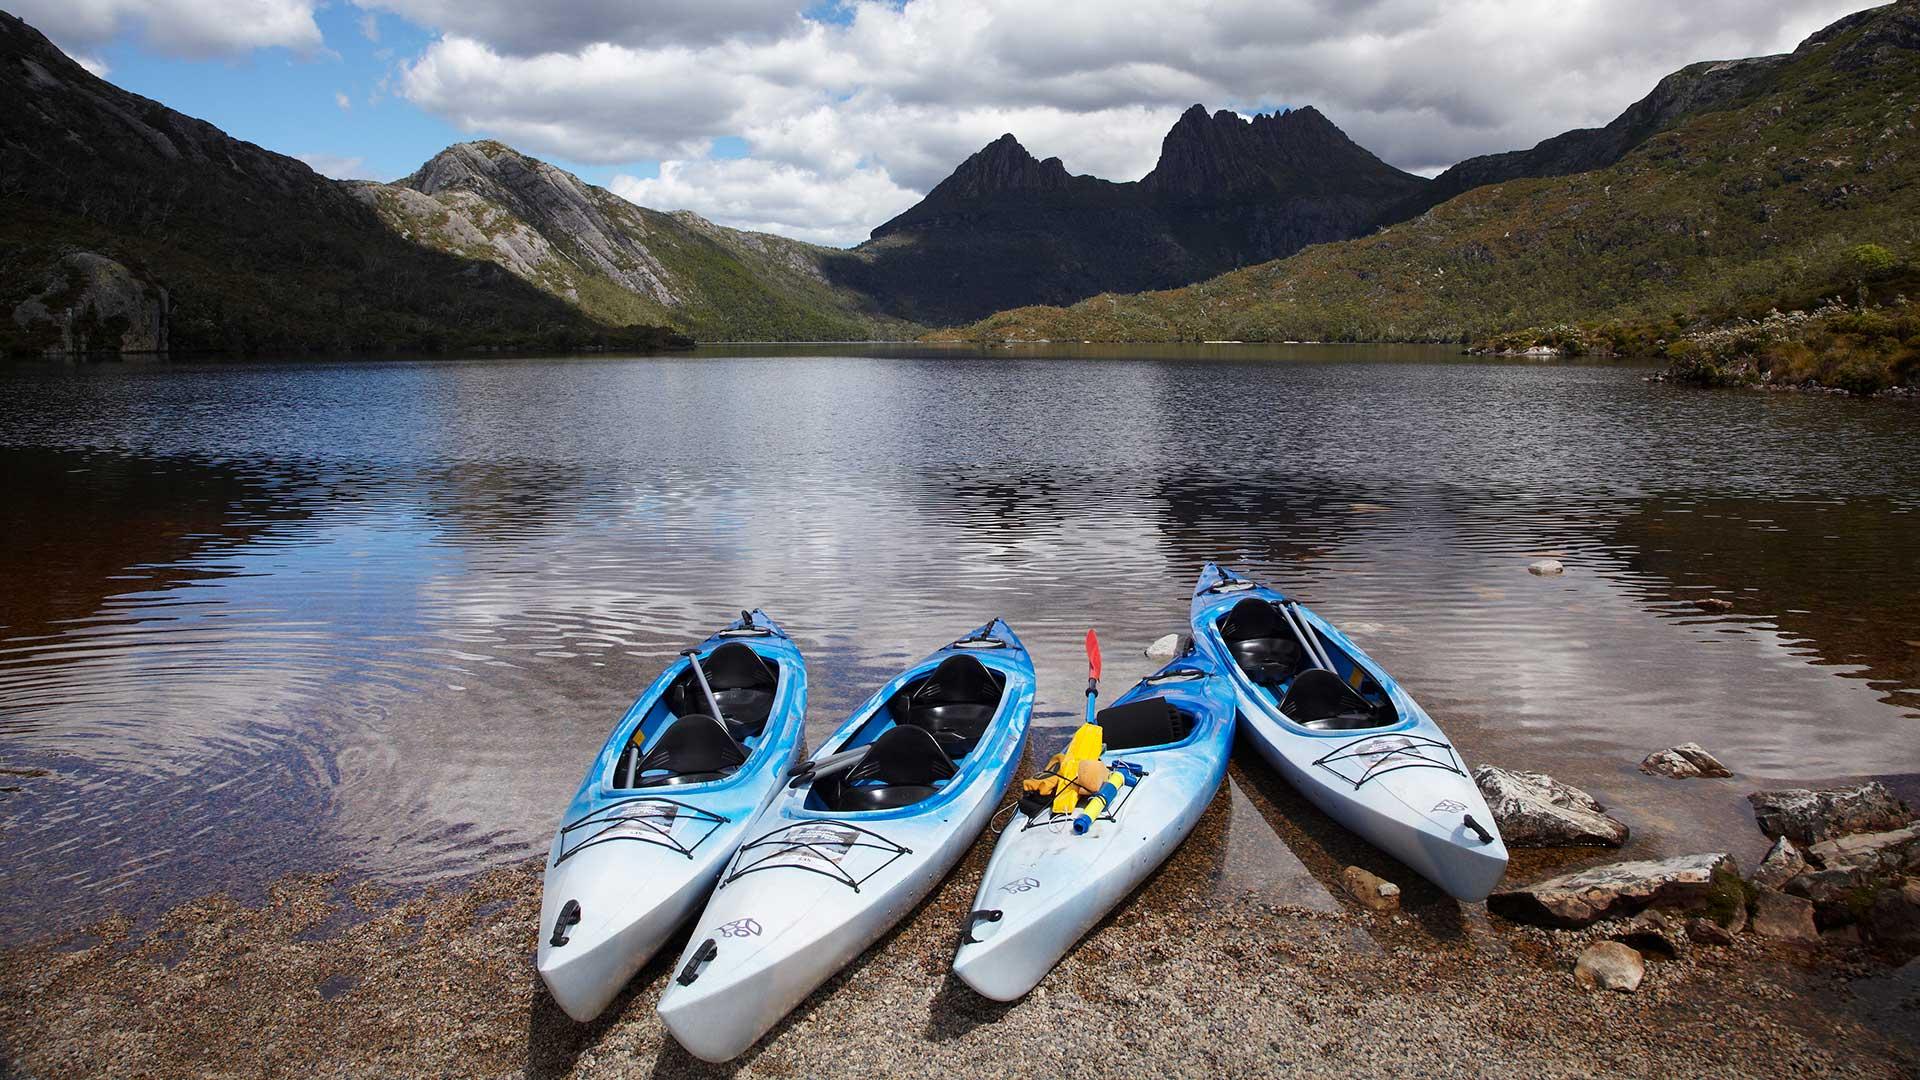 Kayaks, Cradle Mountain and Dove Lake - Lake St Clair National Park, Western Tasmania, Australia